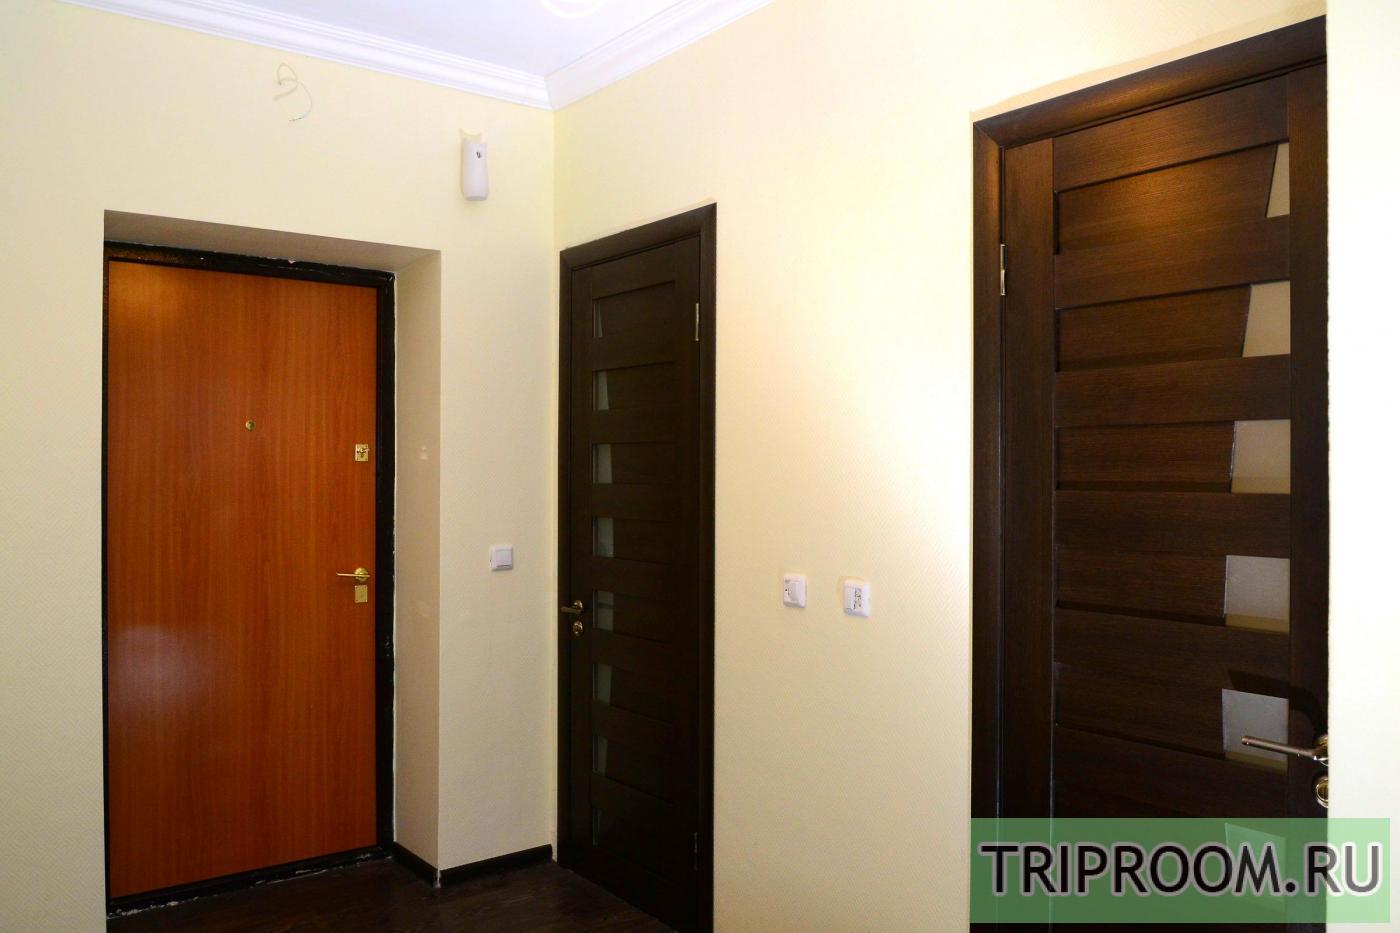 1-комнатная квартира посуточно (вариант № 14713), ул. Петра Смородина улица, фото № 4